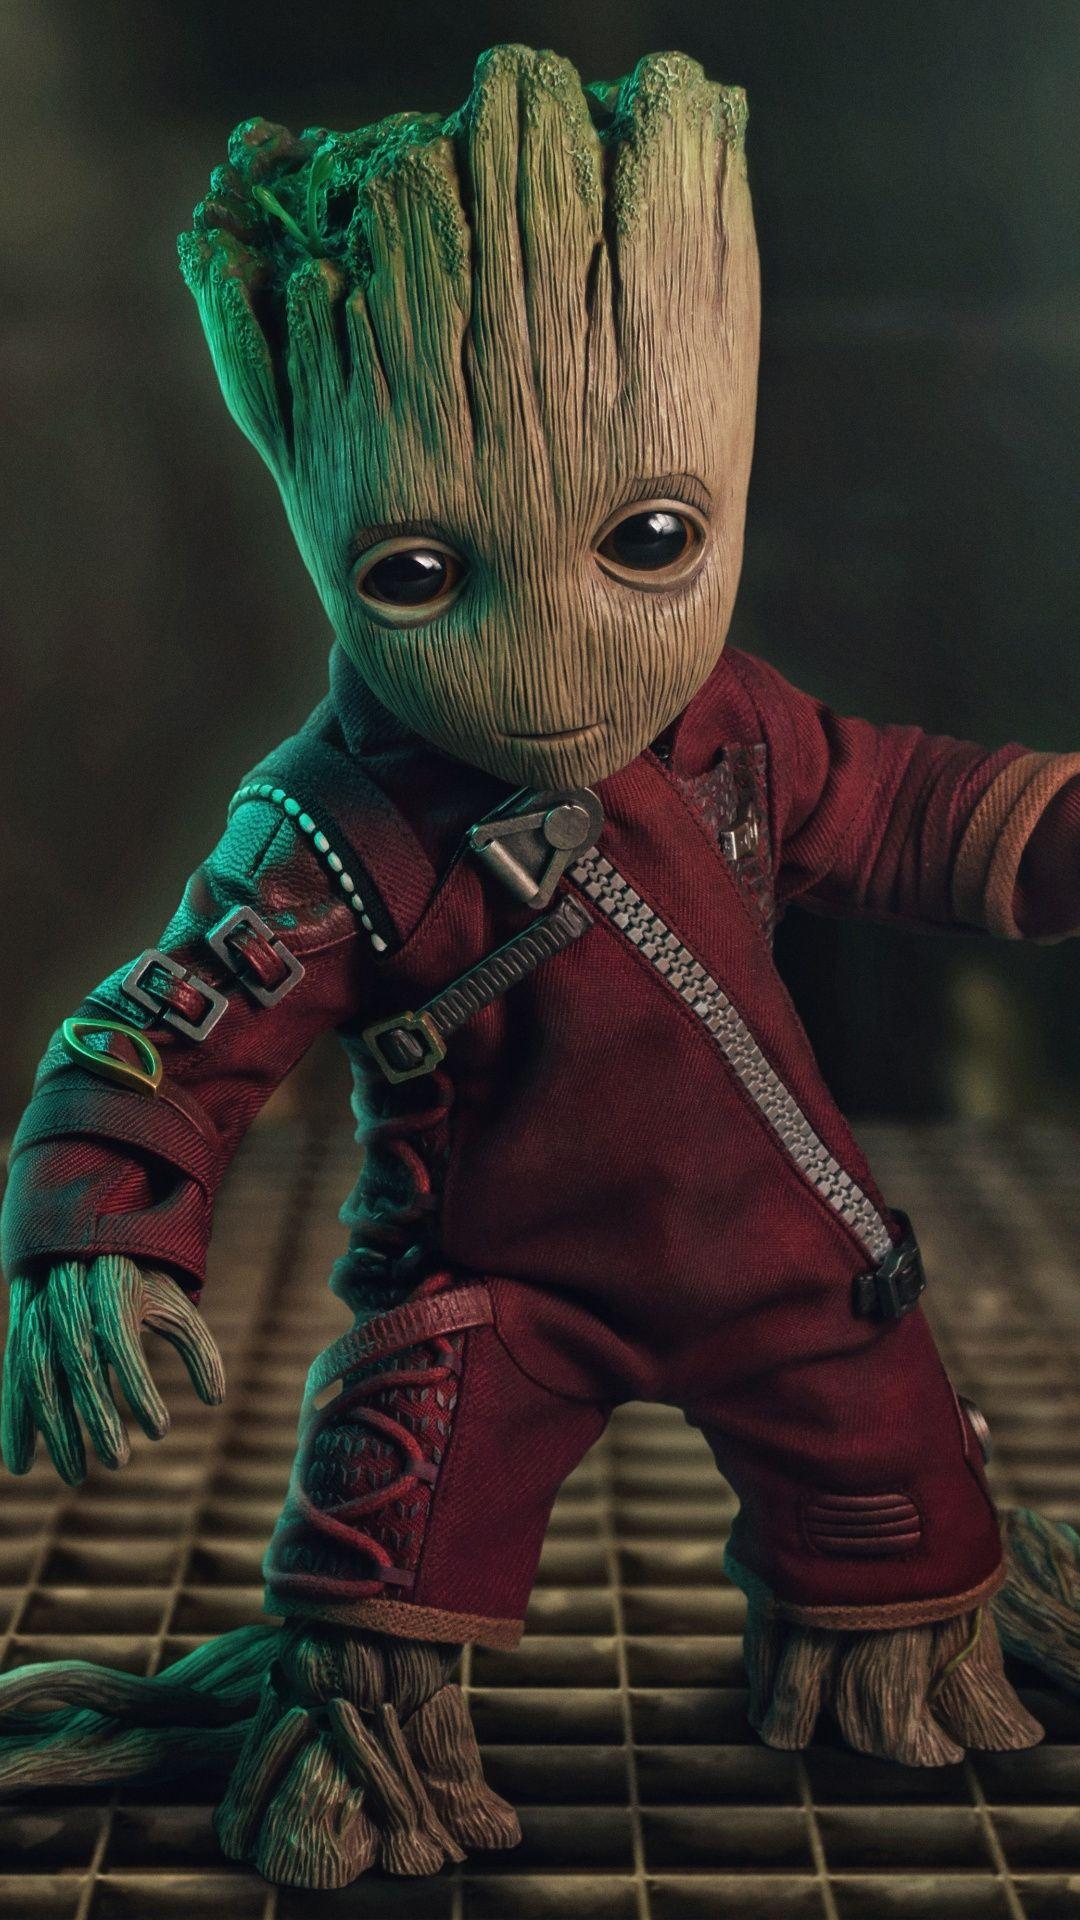 Baby Groot Guardians Of The Galaxy Superhero Fan Art 1080x1920